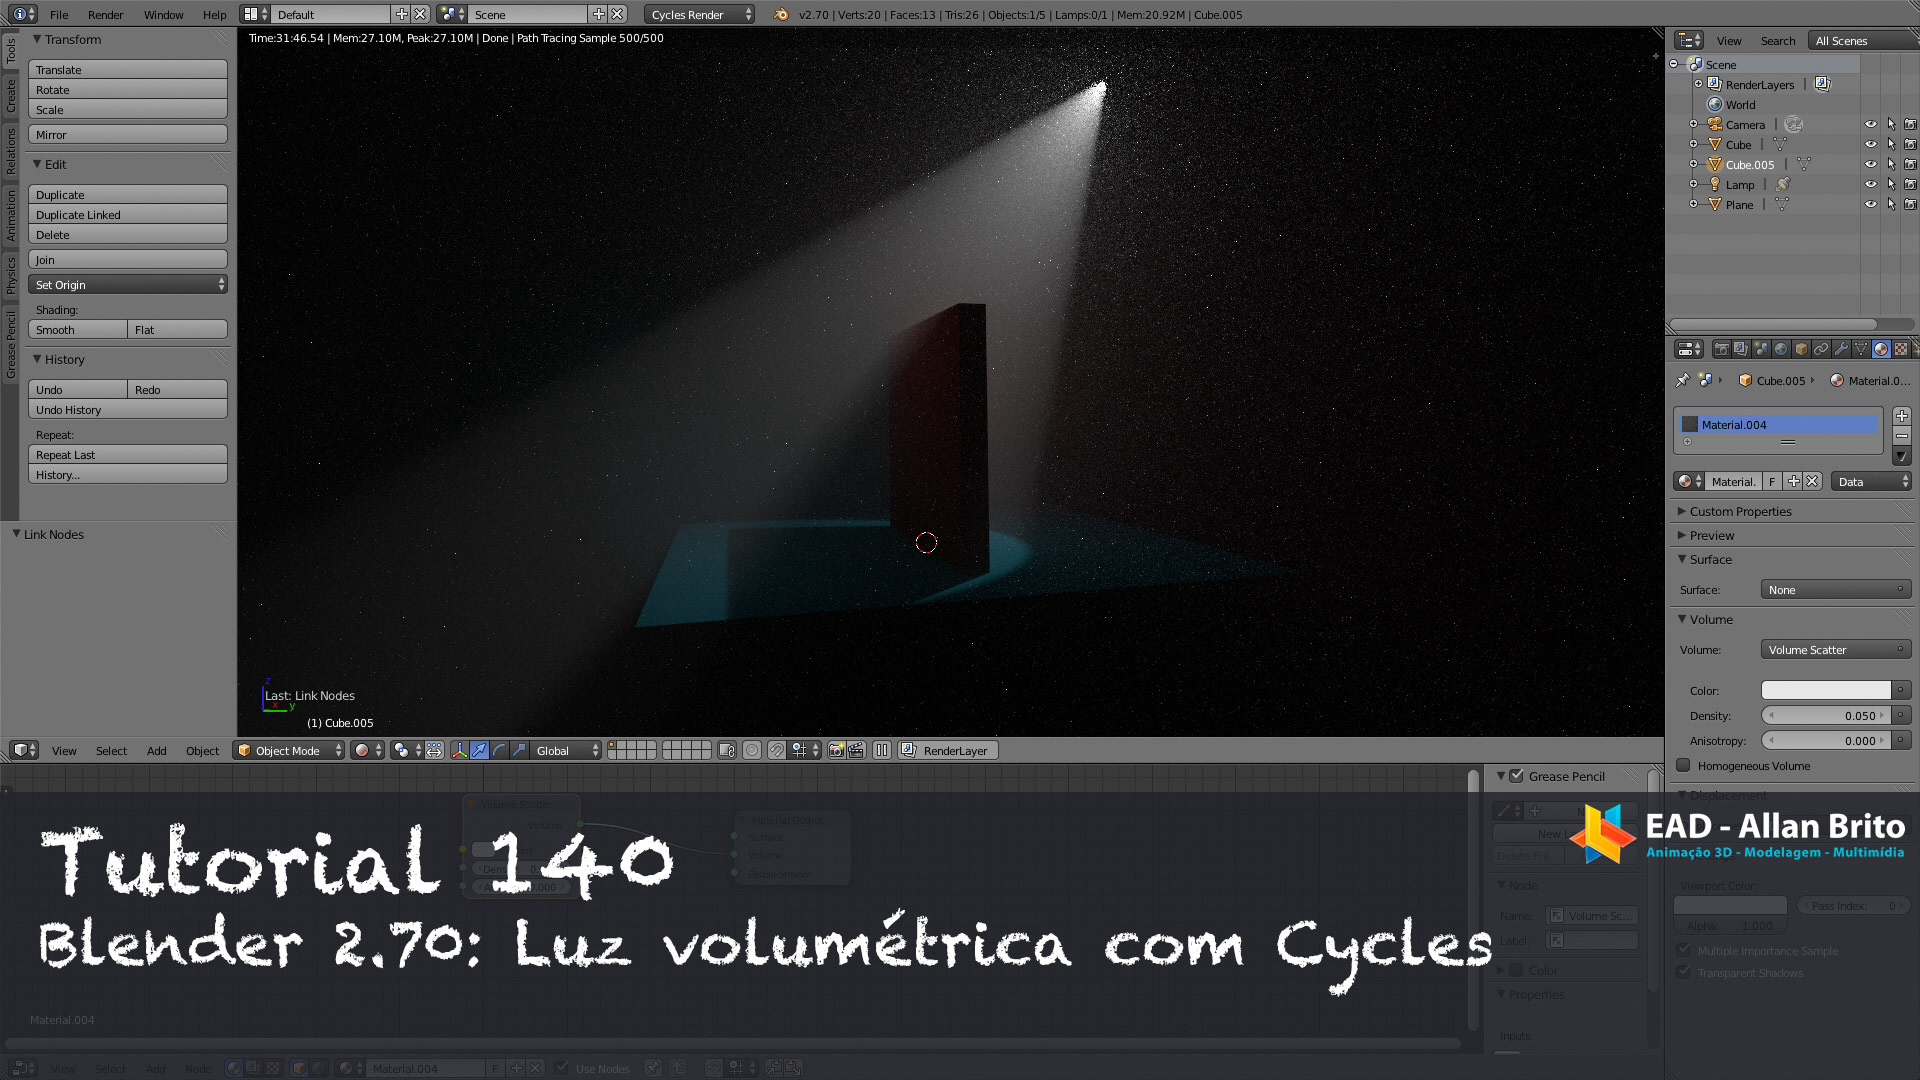 Tutorial 140 – Blender 2.70: Luz volumétrica no Cycles